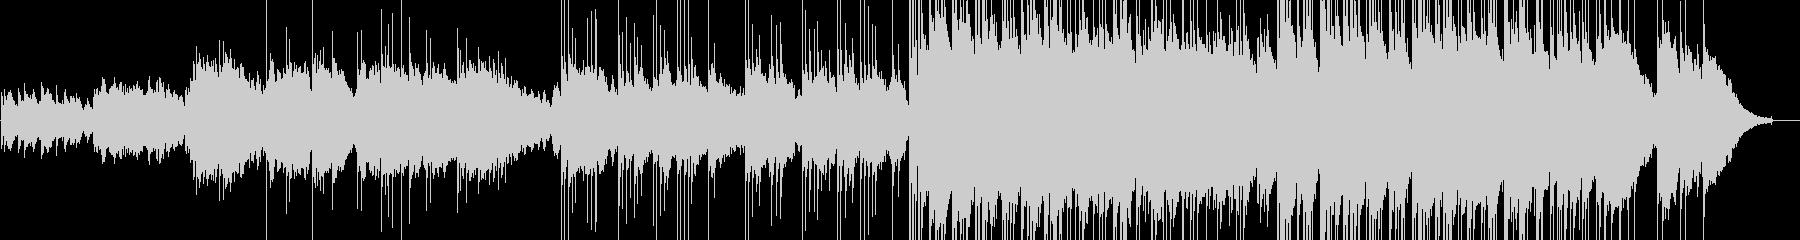 G.Gt.生録_夏のリゾートBGM1の未再生の波形